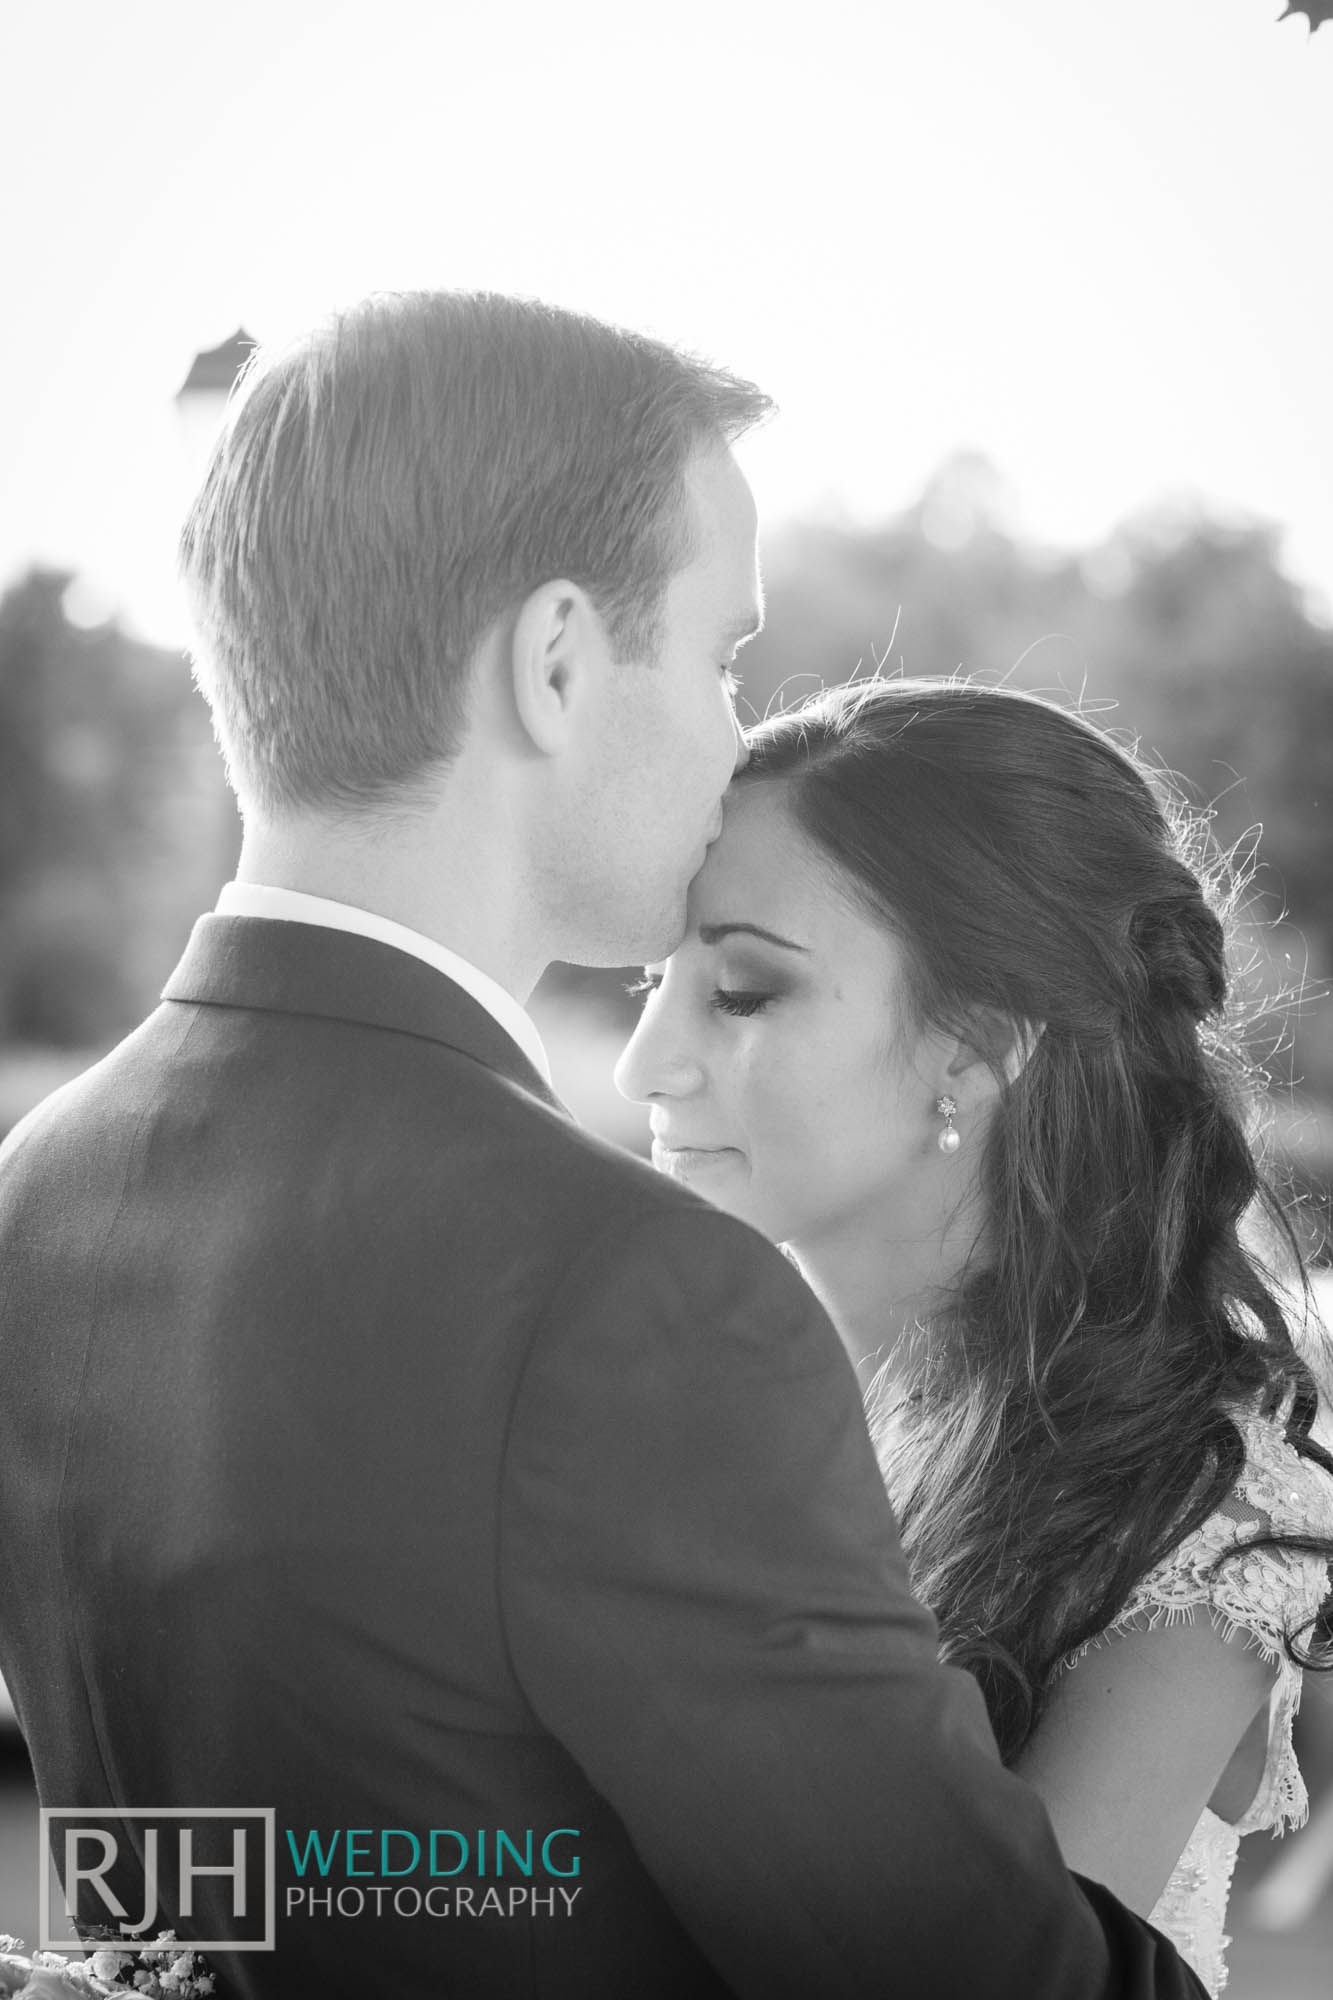 RJH Wedding Photography_Tankersley Manor Wedding_44.jpg